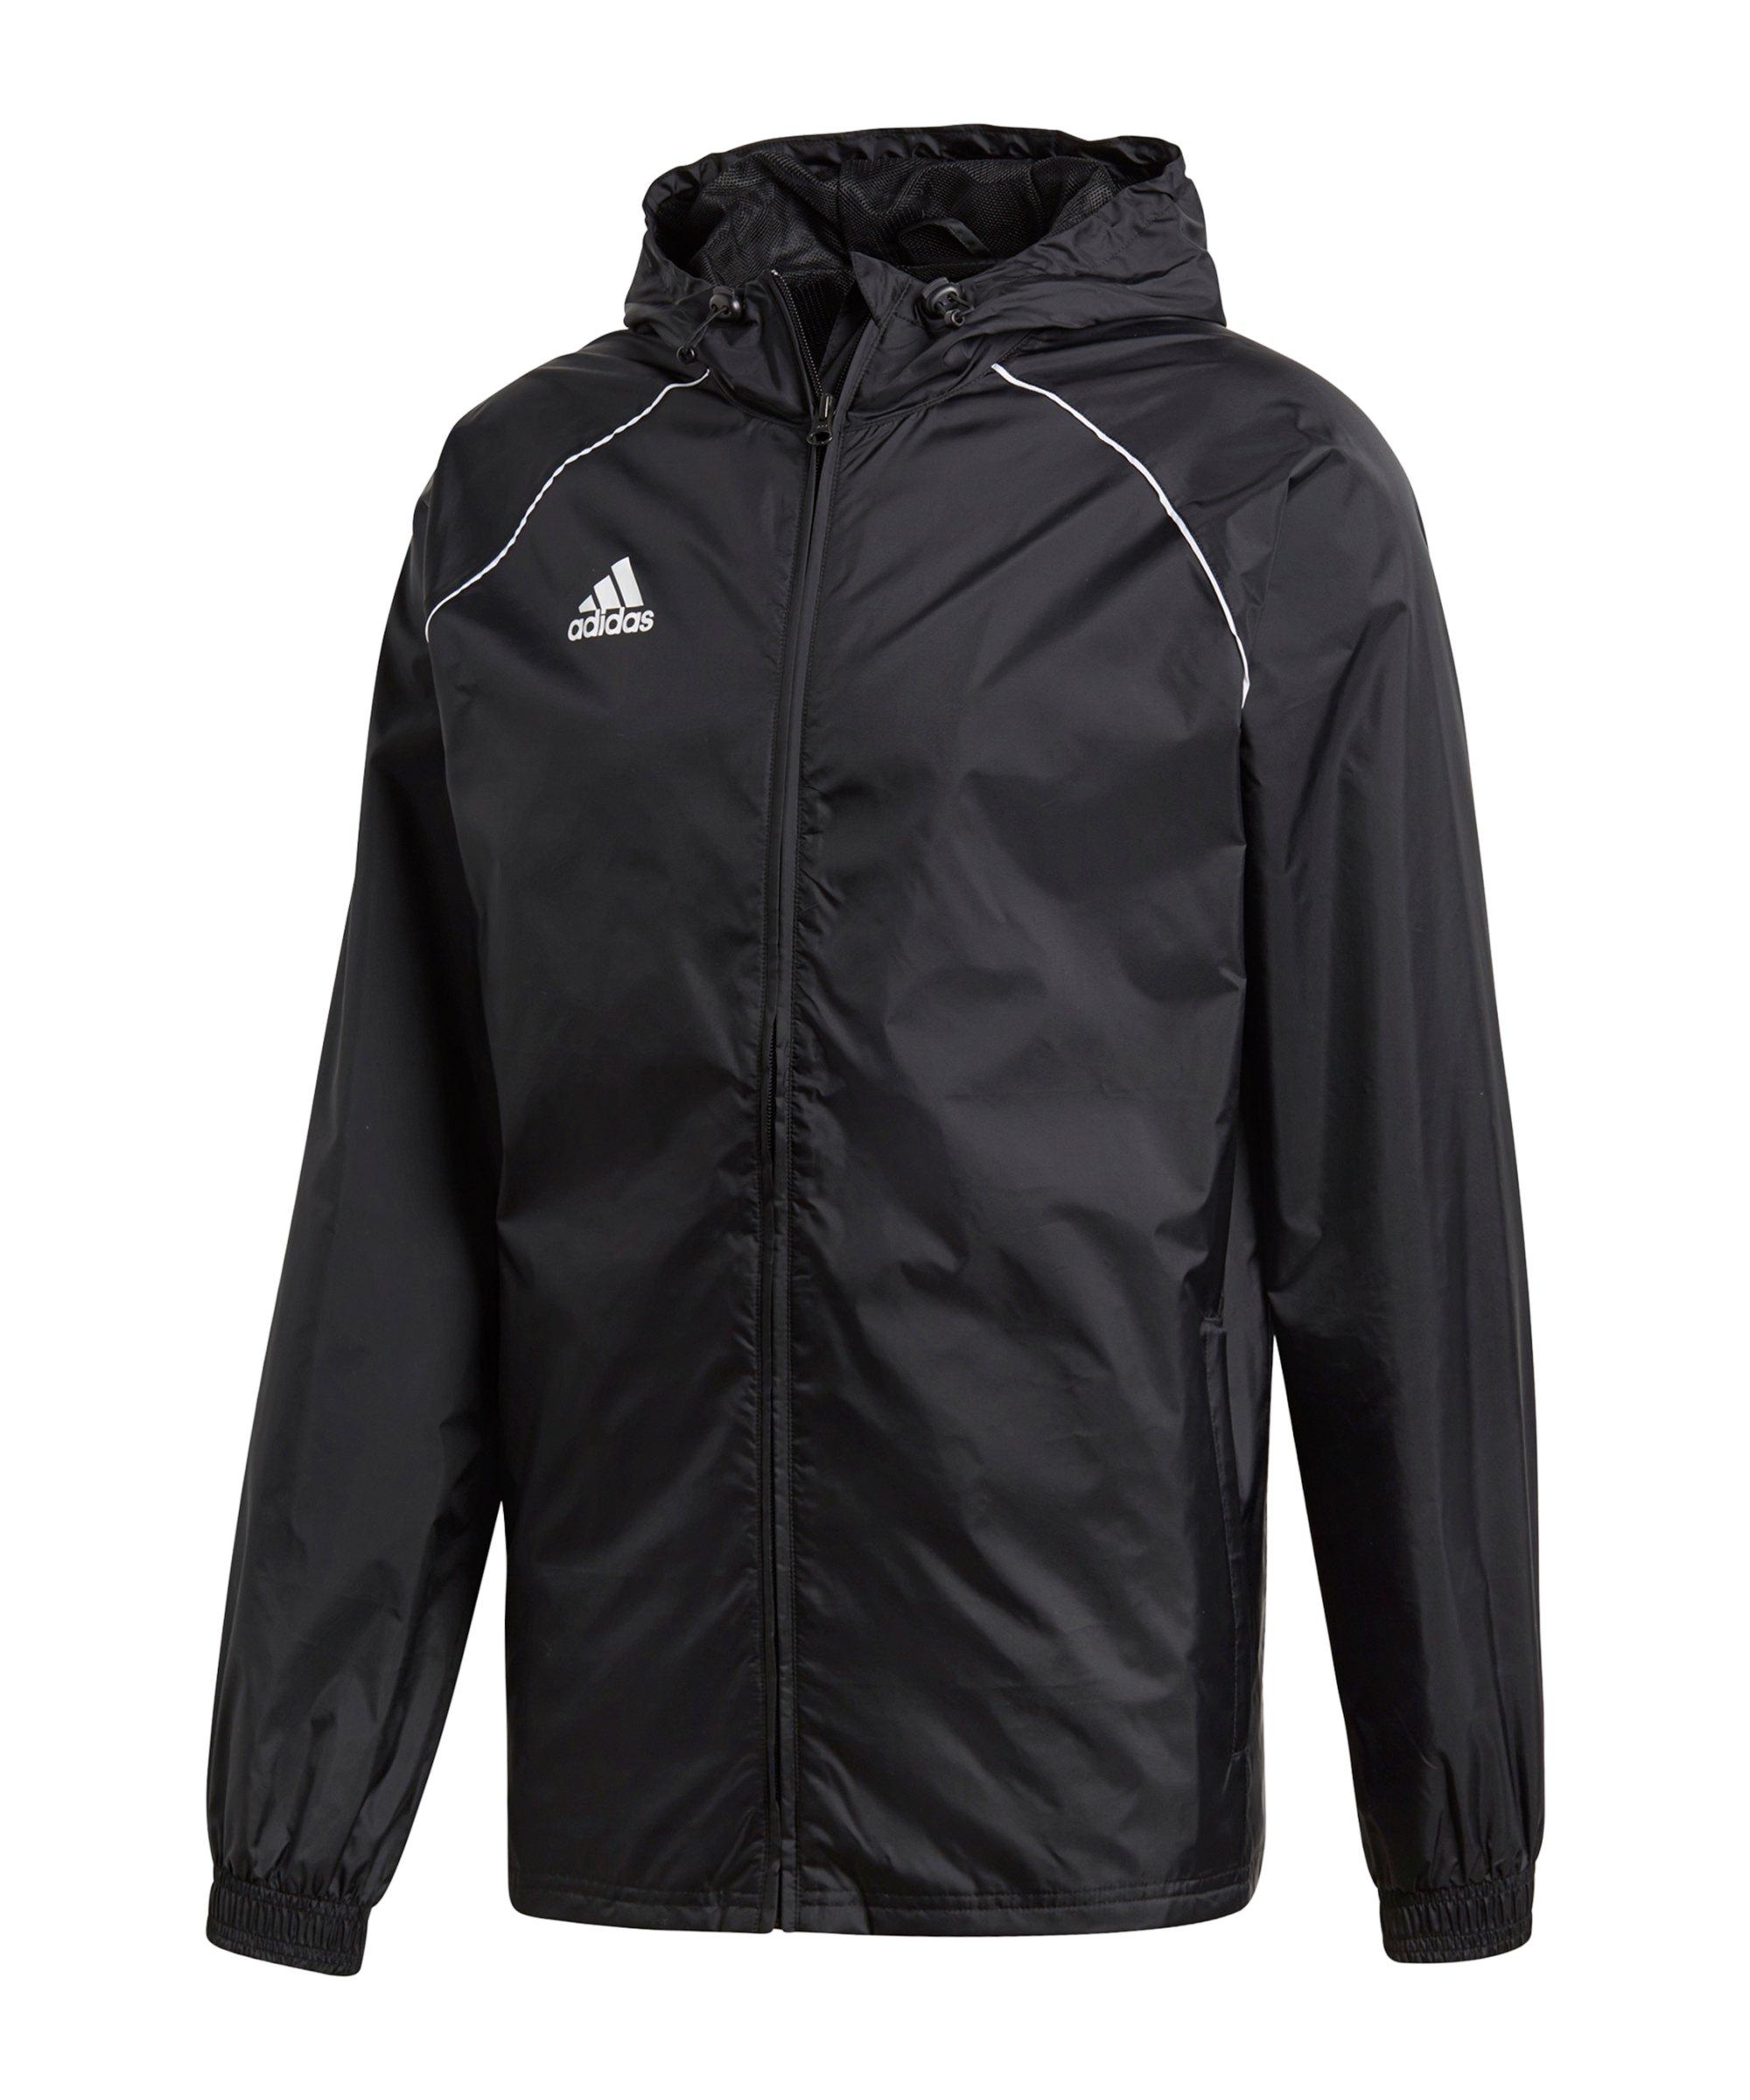 Adidas Jacken Core 18 Rain Jacket, CE9048, Größe: XXL